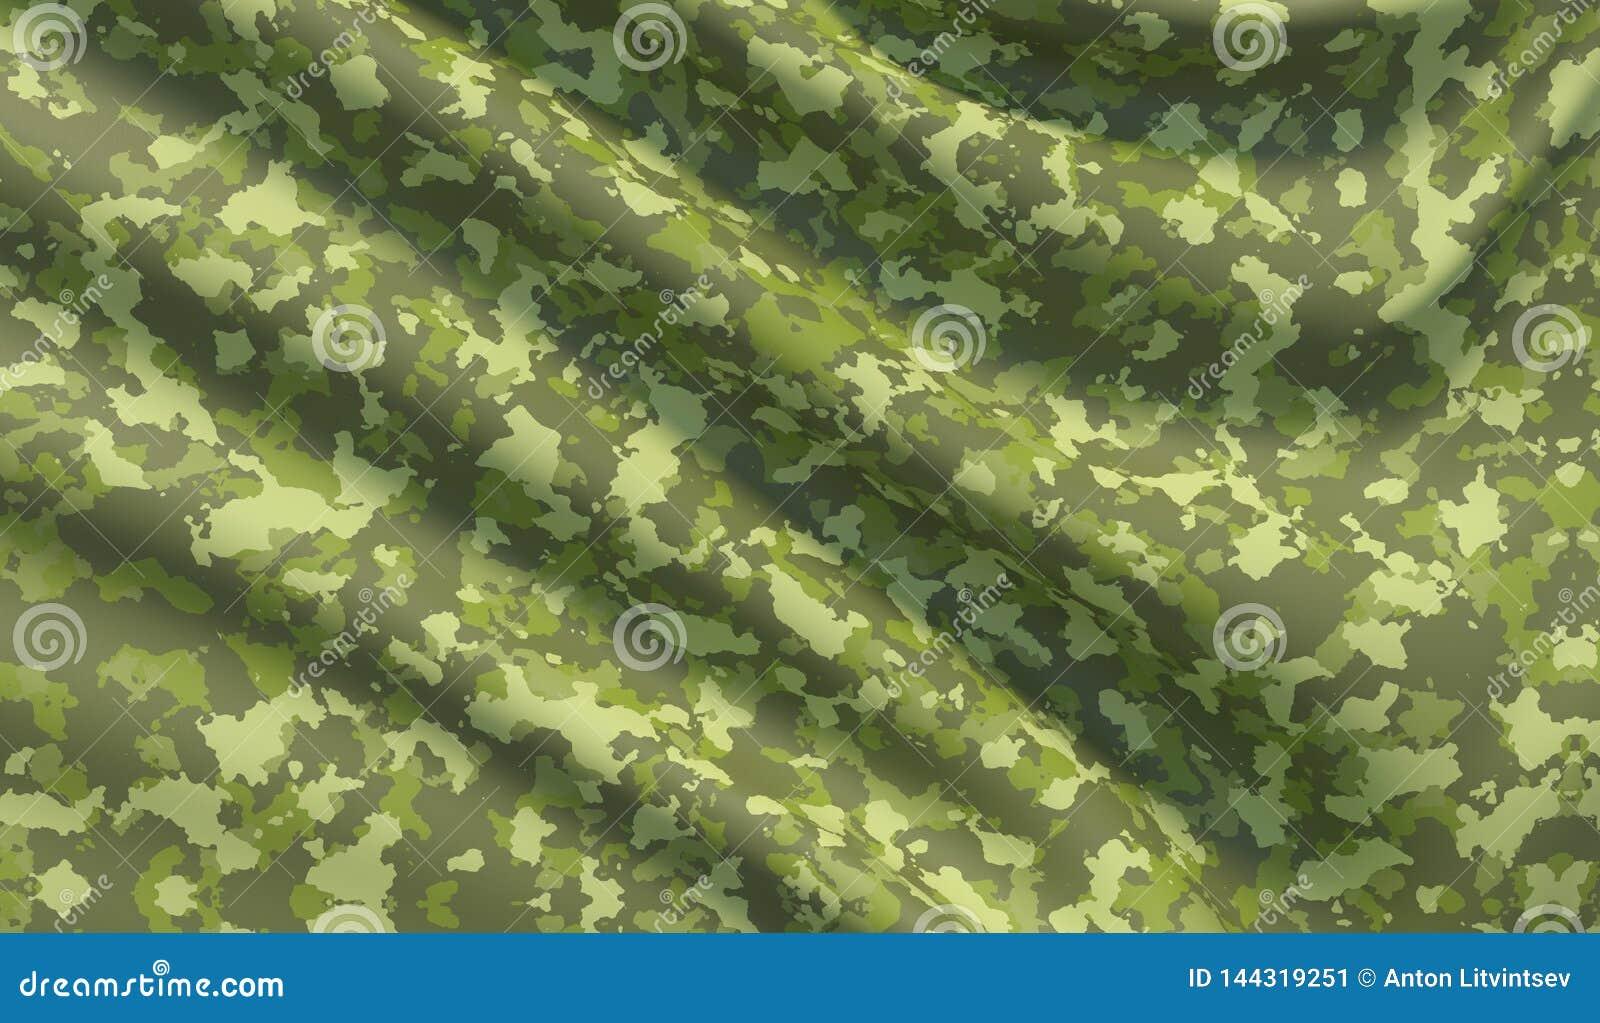 Military war background camouflage khaki fabric texture. 3D illustration.